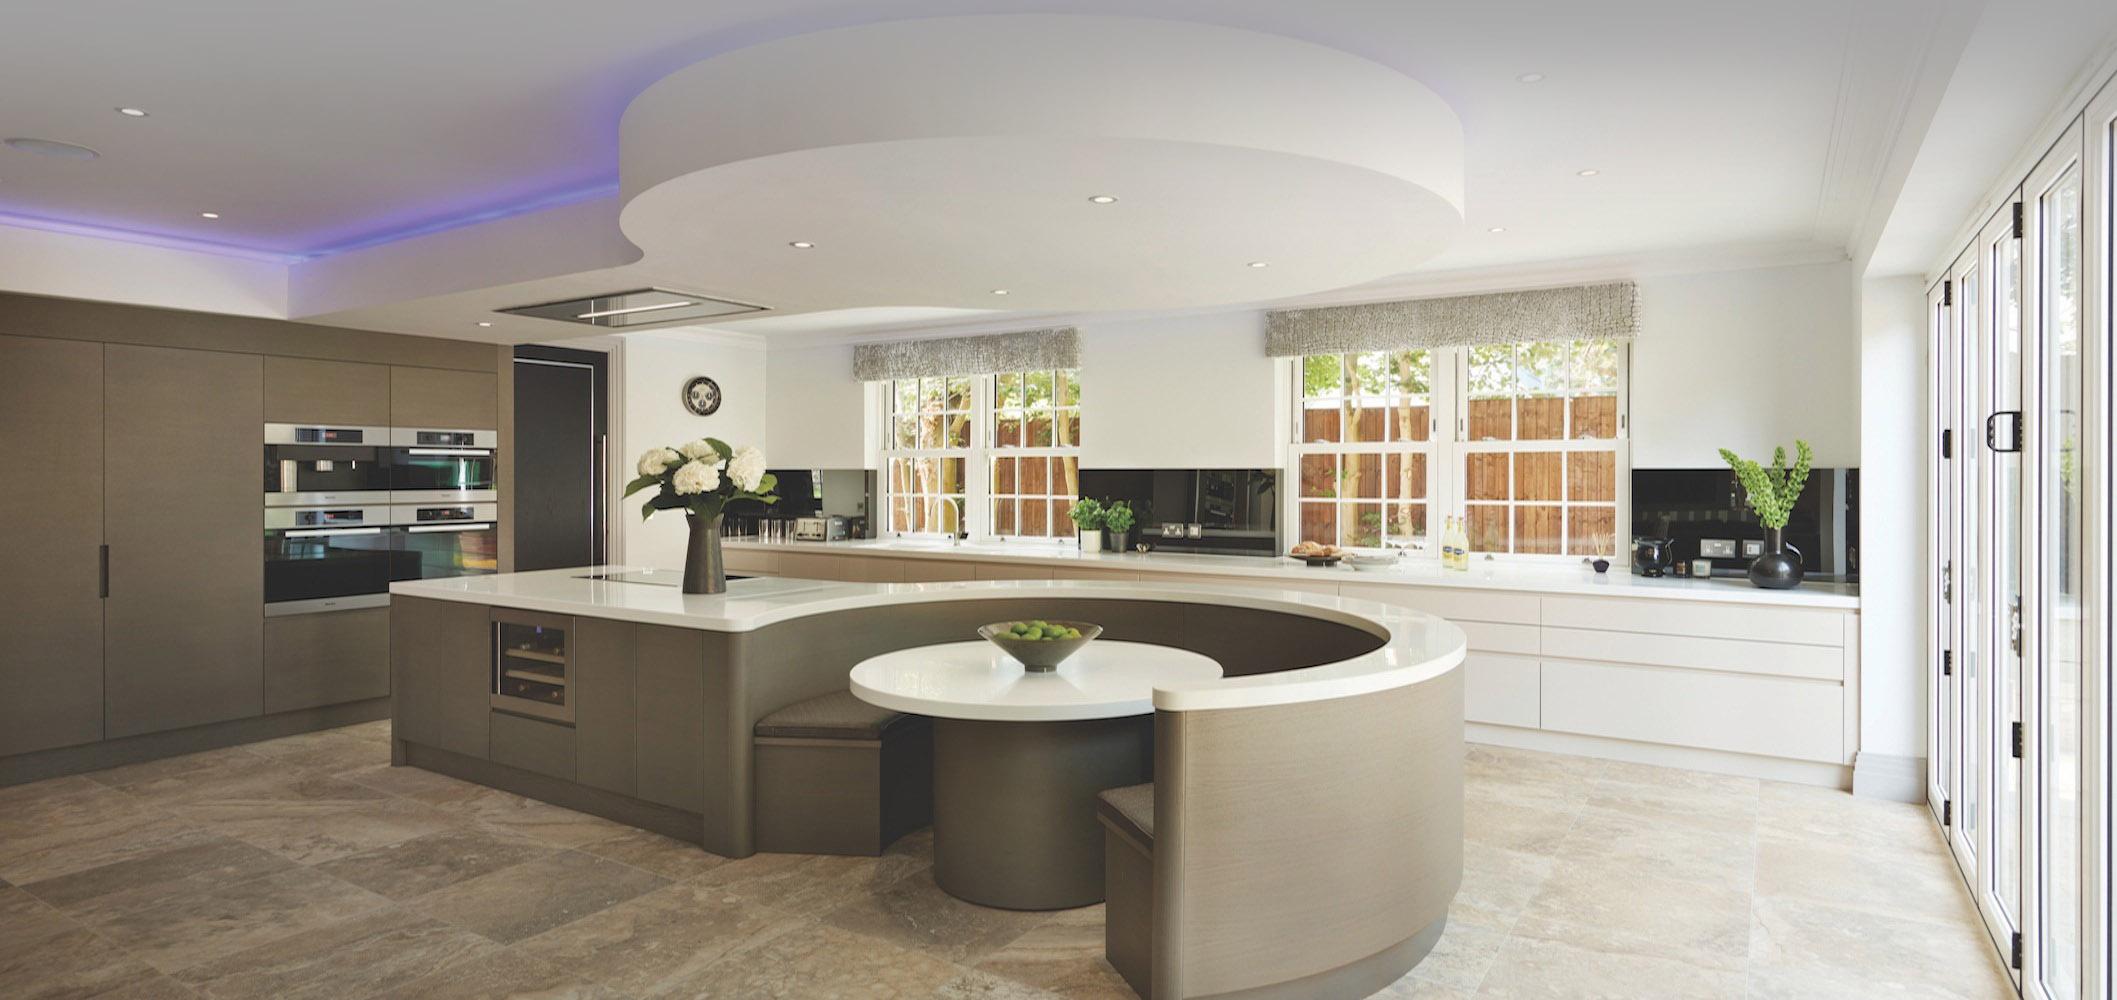 20 state-of-the-art modern kitchen designs by reeva design